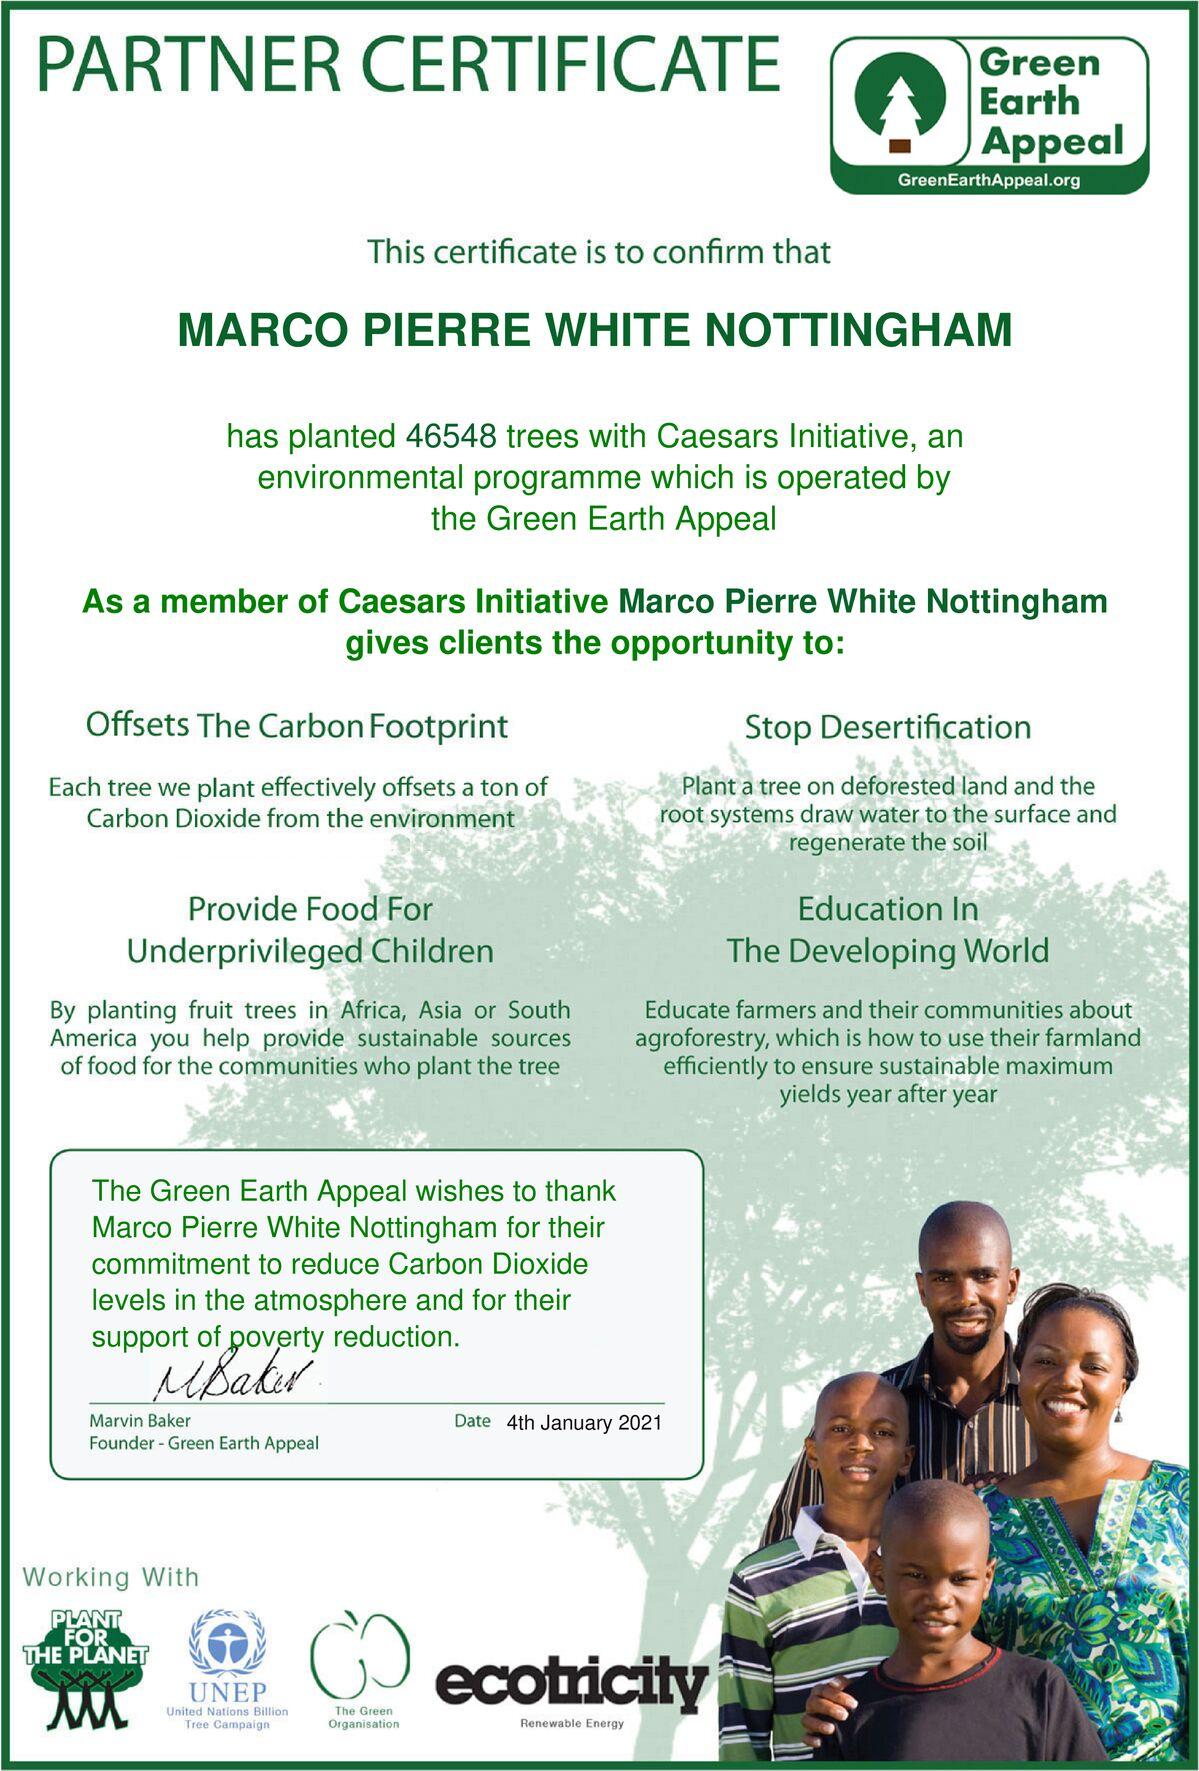 Marco Pierre White Nottingham